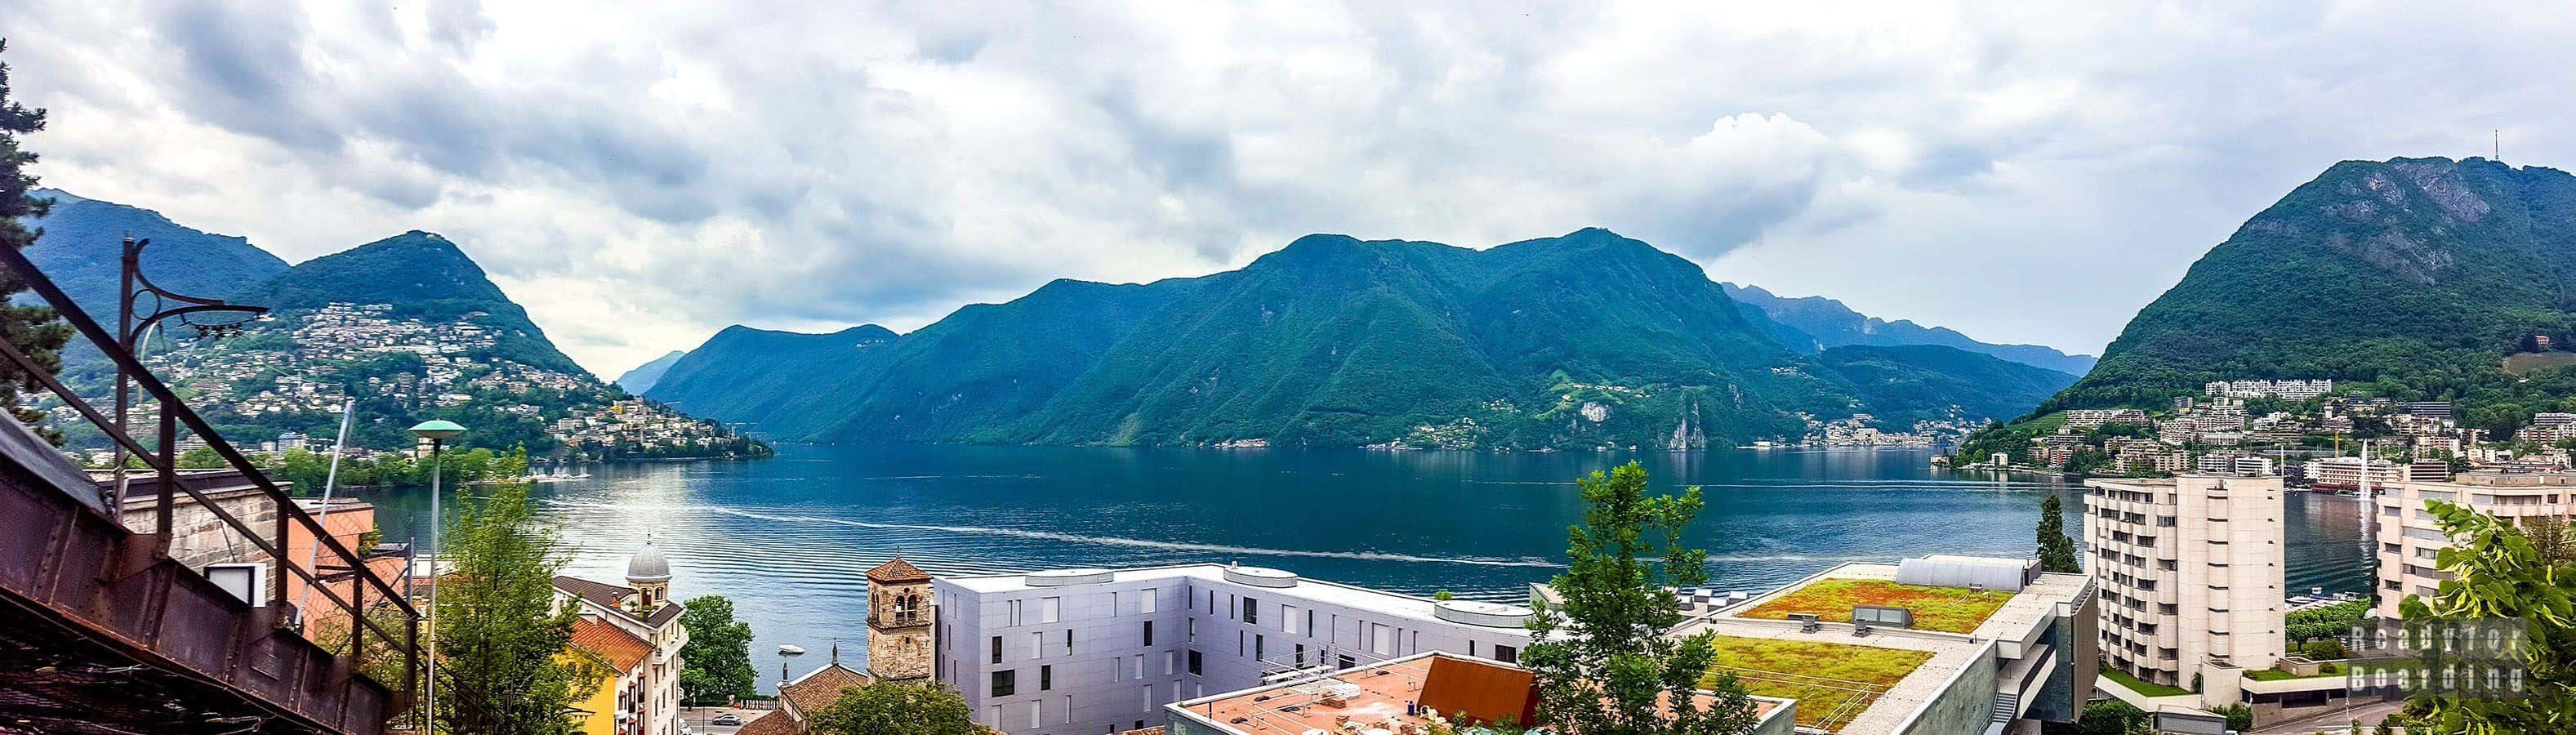 Panorama: Lugano - Szwajcaria